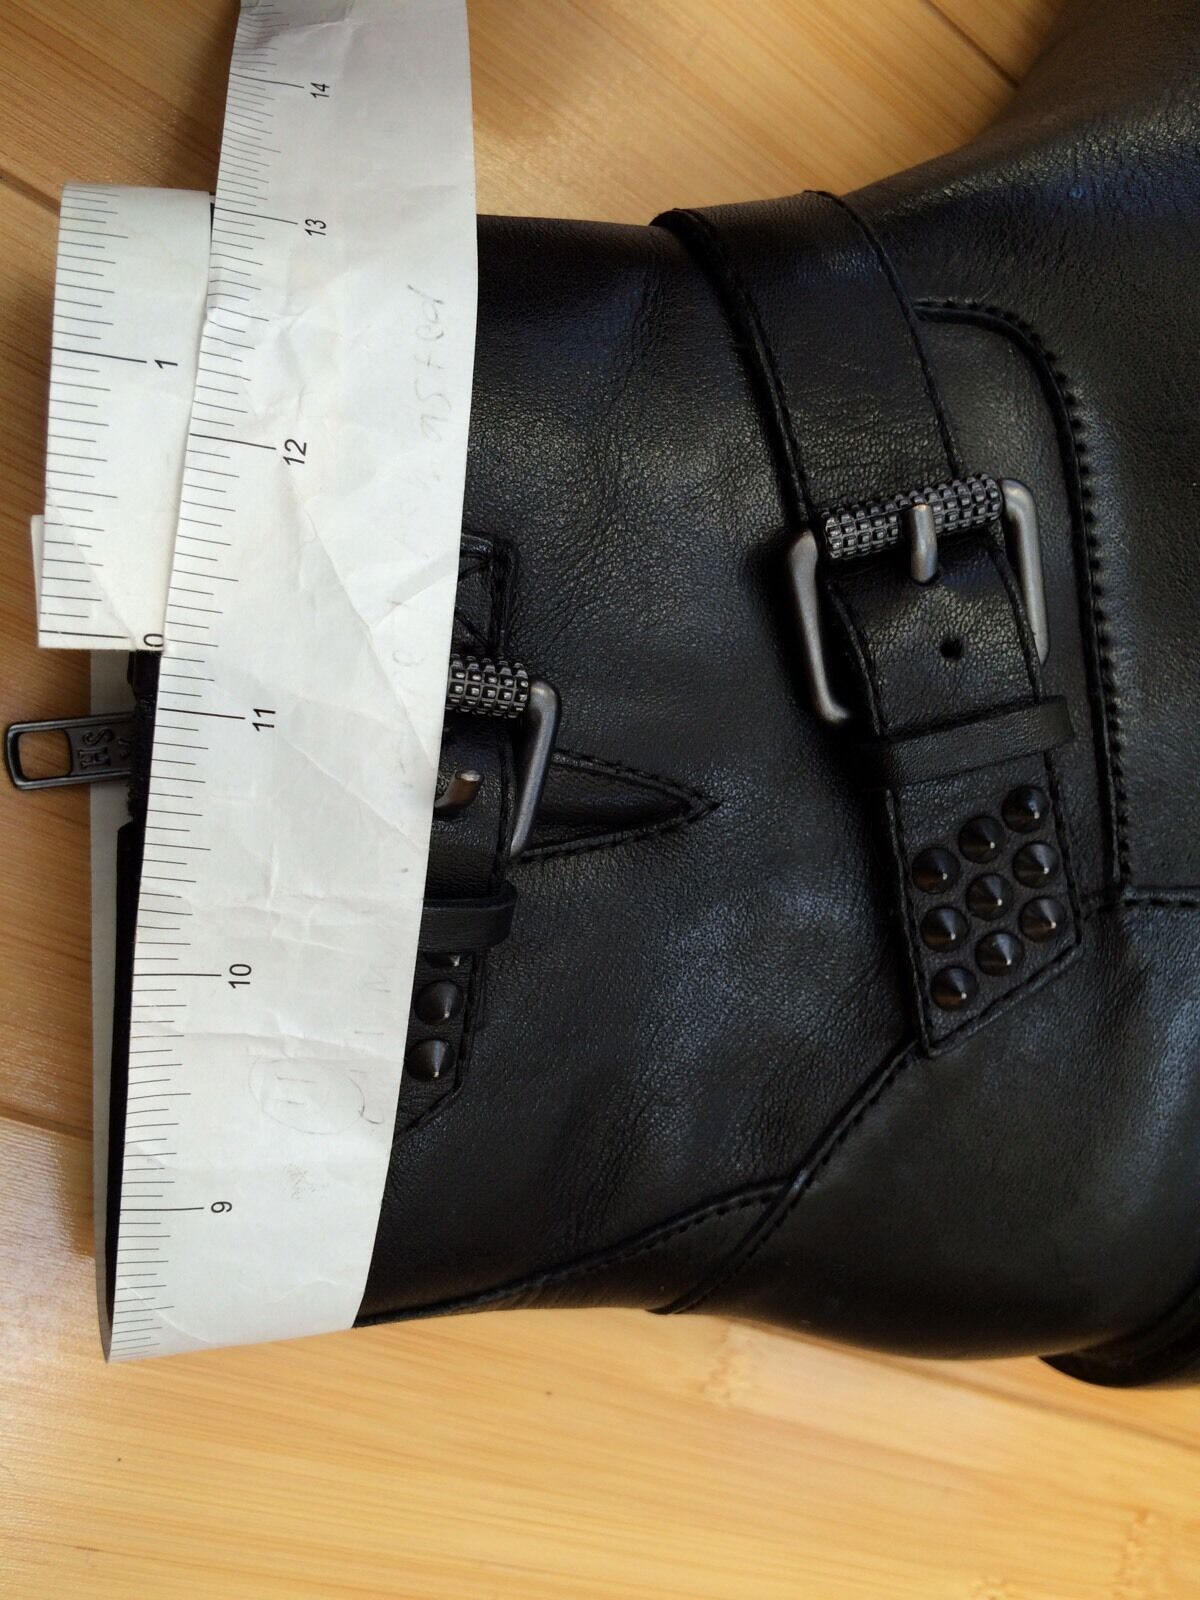 Nuevas botas al Tobillo ceniza Punky bis Tachonado Tachuelas 38 Bota Botines Negro Cuero Talla 38 Tachuelas 8 6354a7